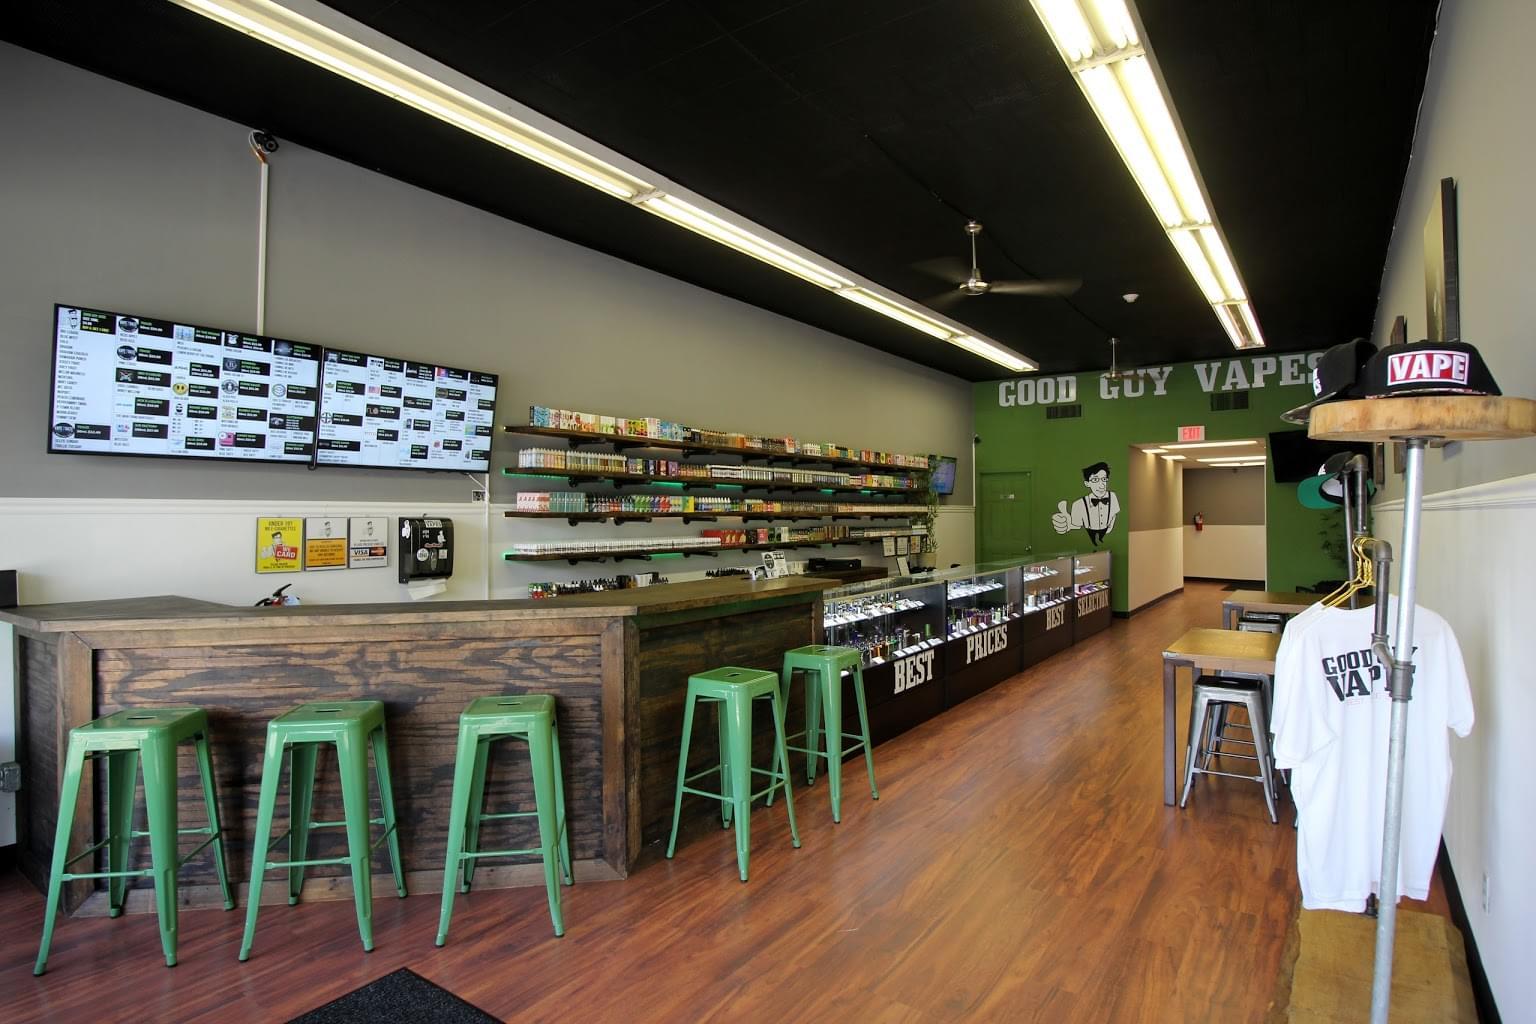 Good Guy Vapes - Union, NJ - See-Inside Vaporizer Store